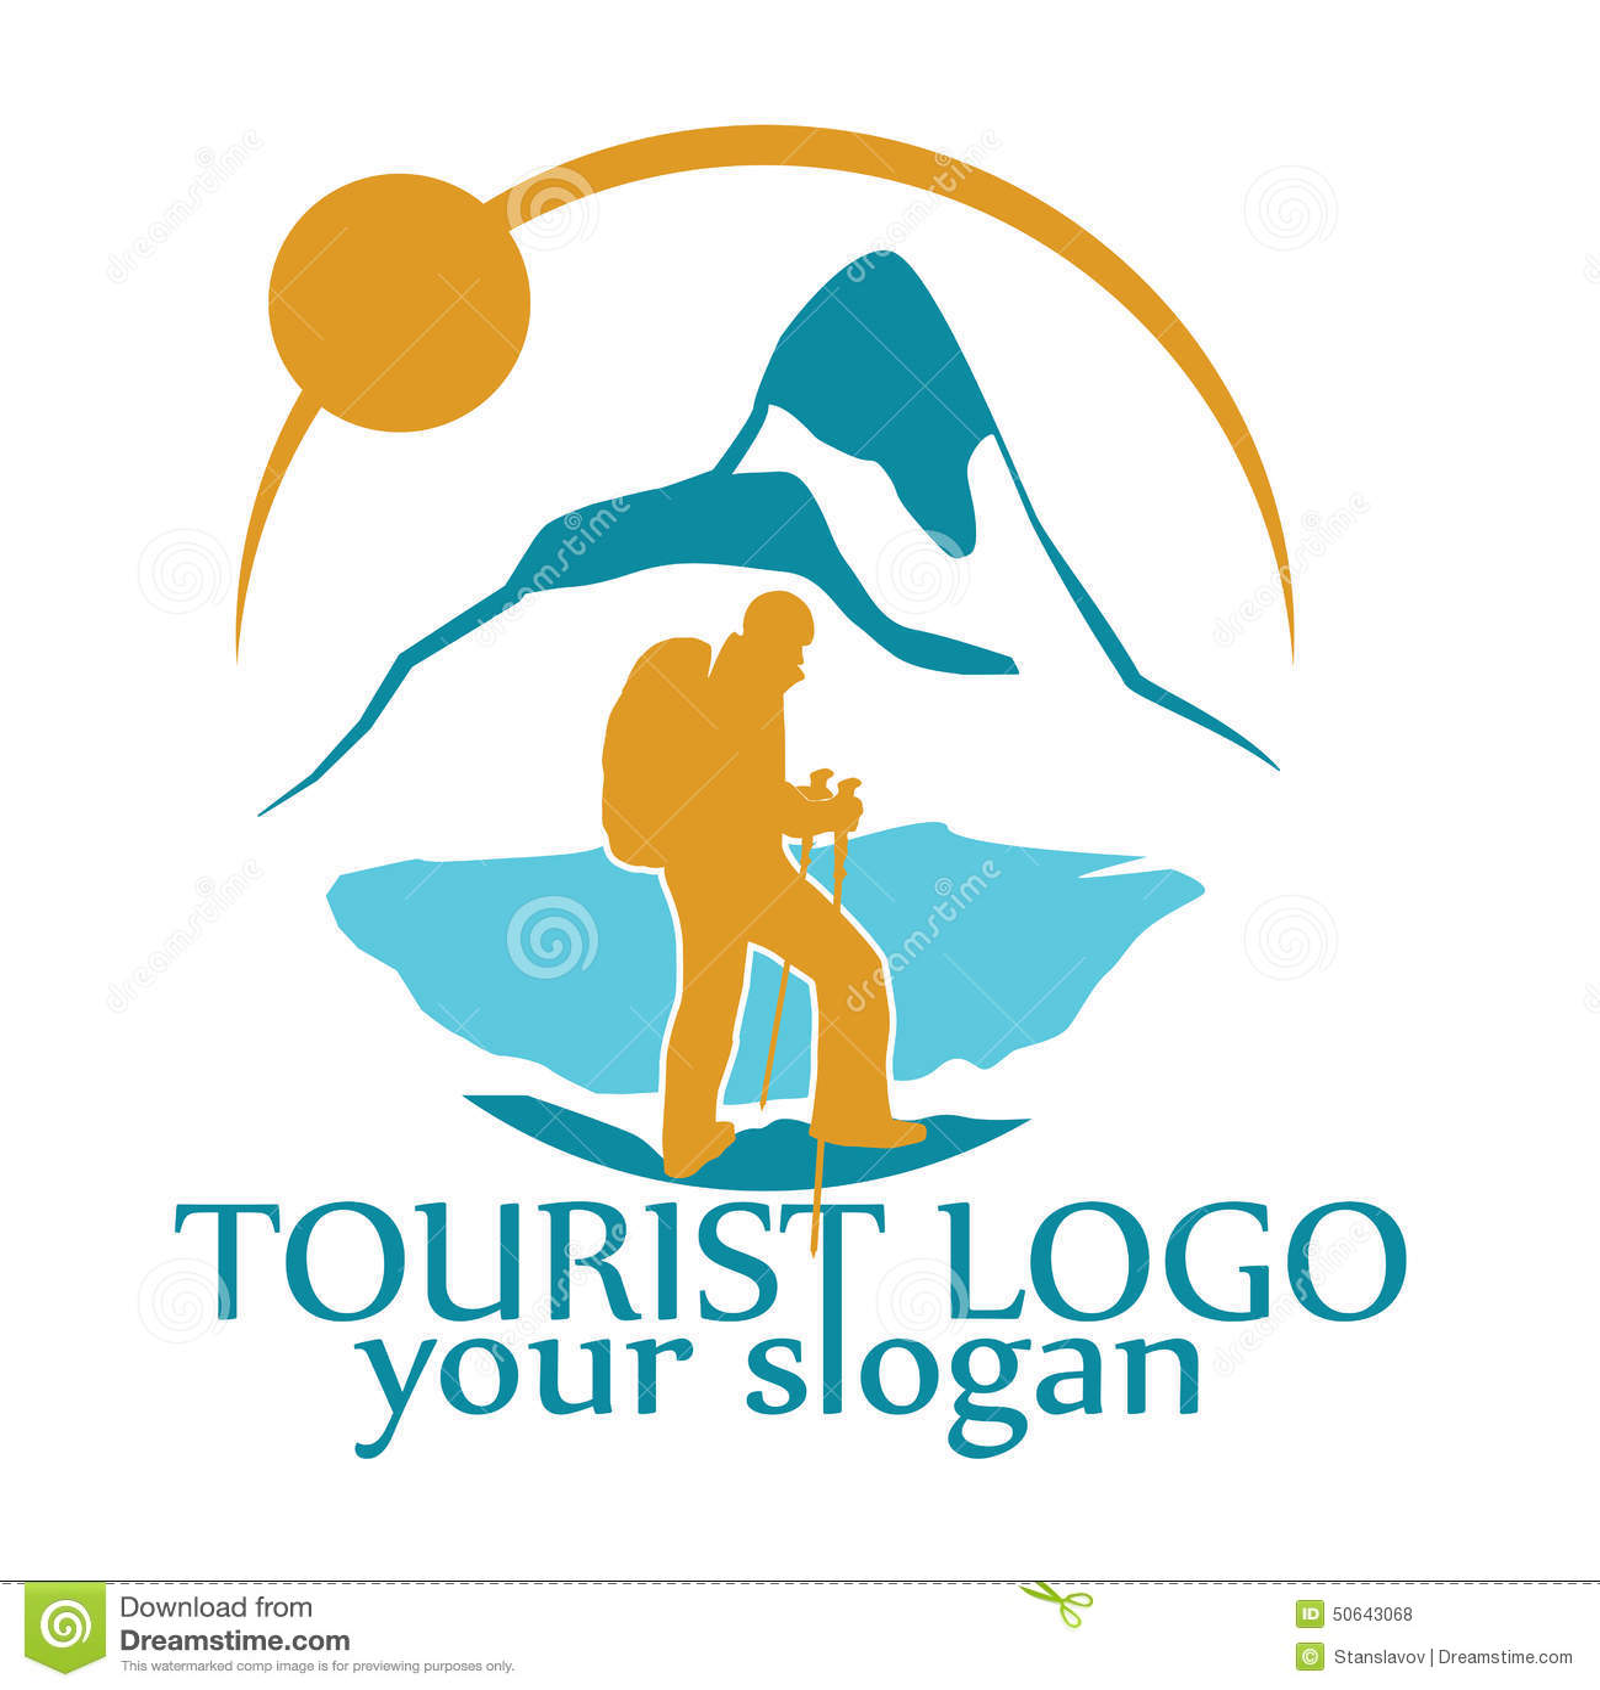 Vector logo for tourism